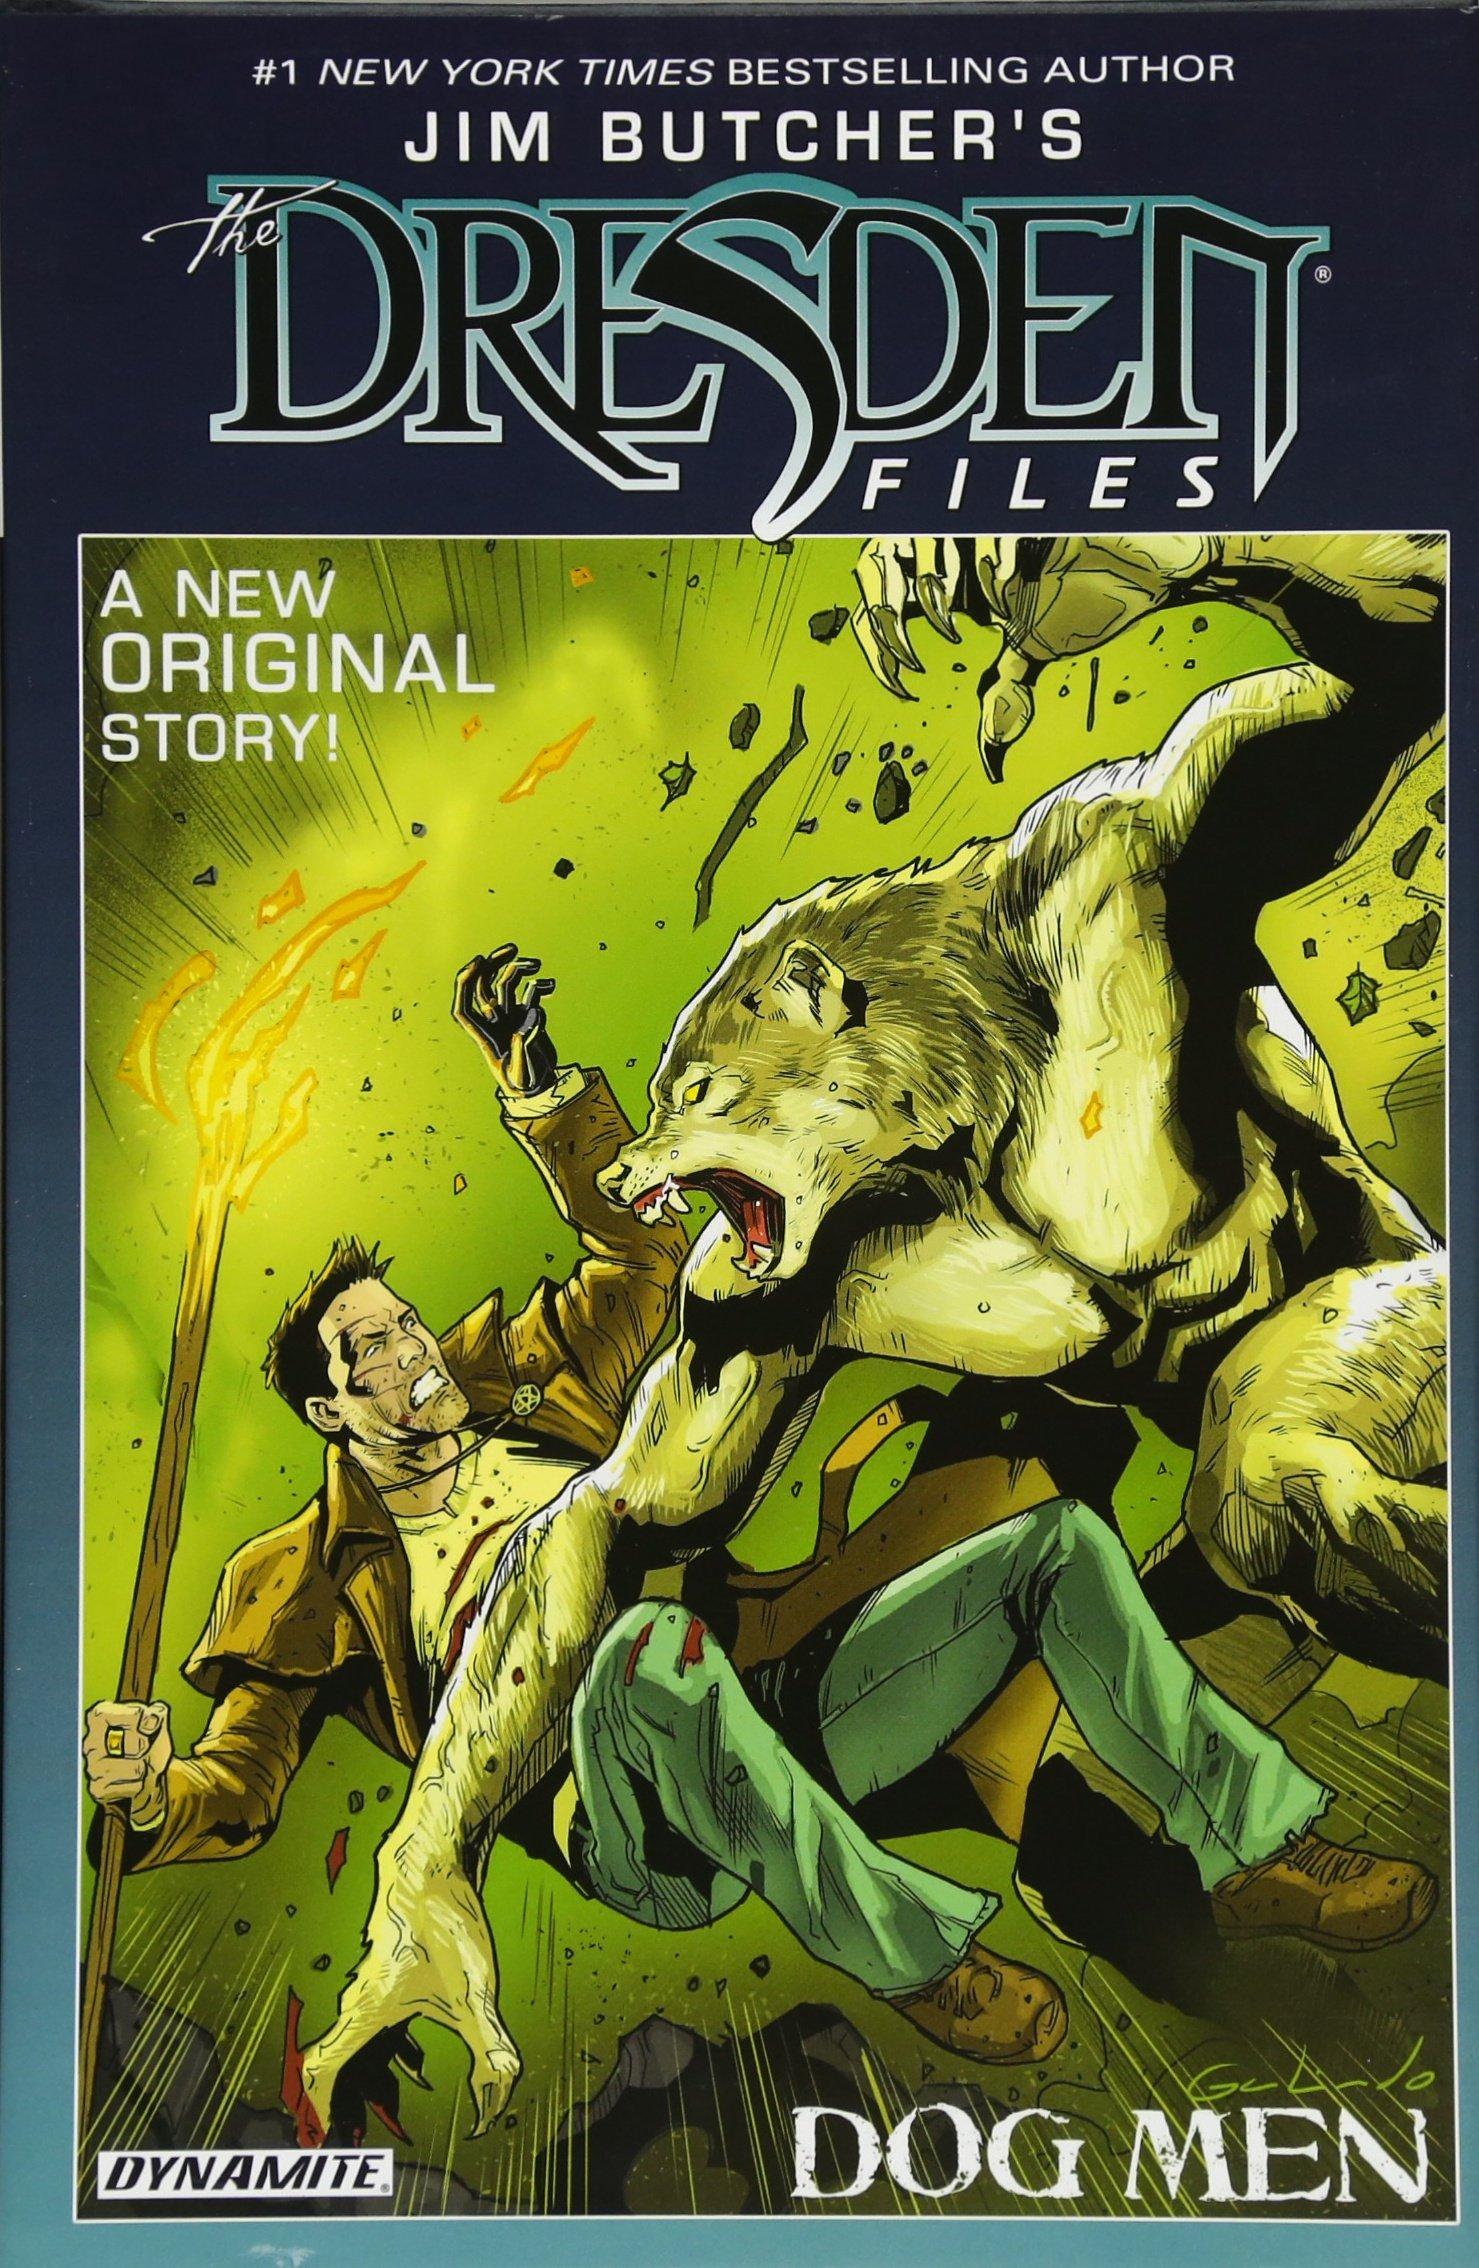 Download Jim Butcher's The Dresden Files: Dog Men ebook